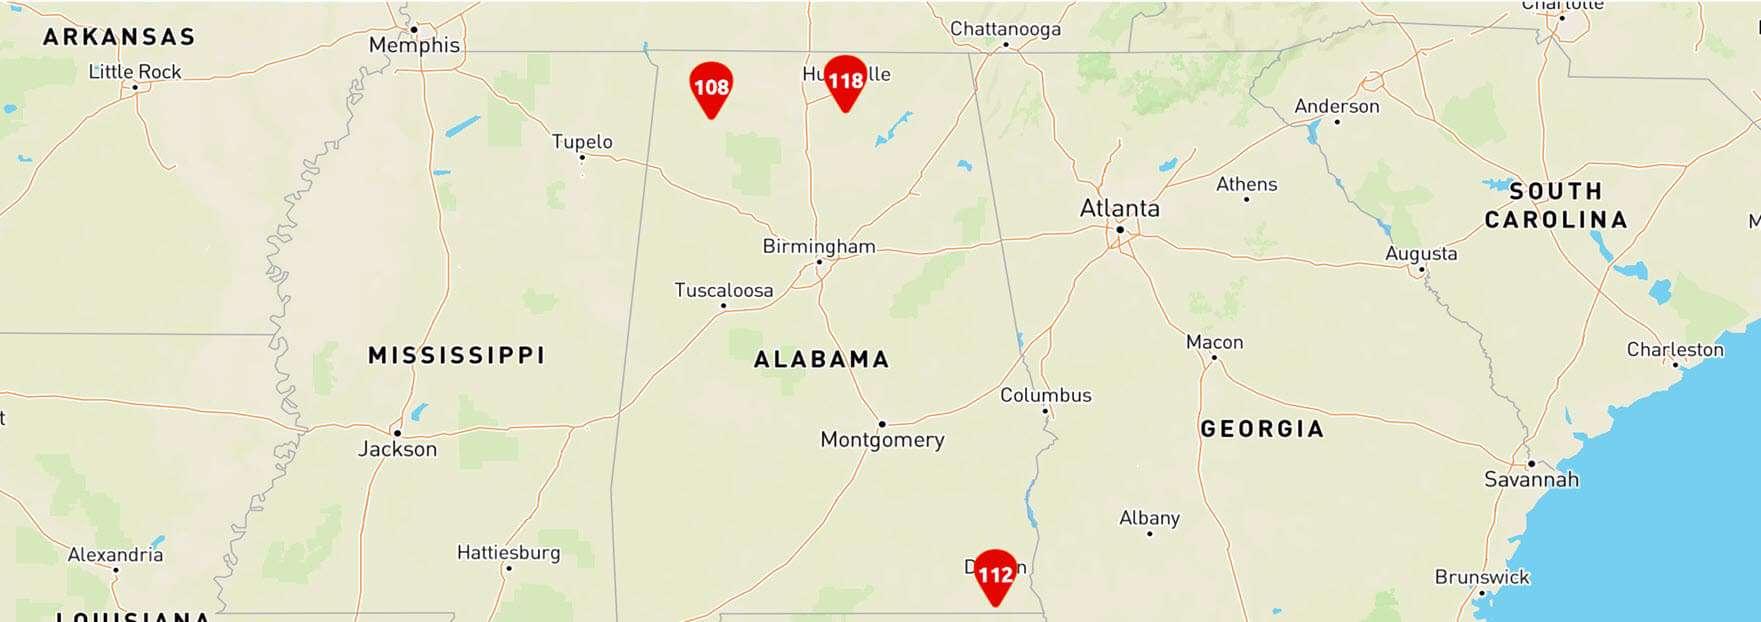 Rural King Alabama locations